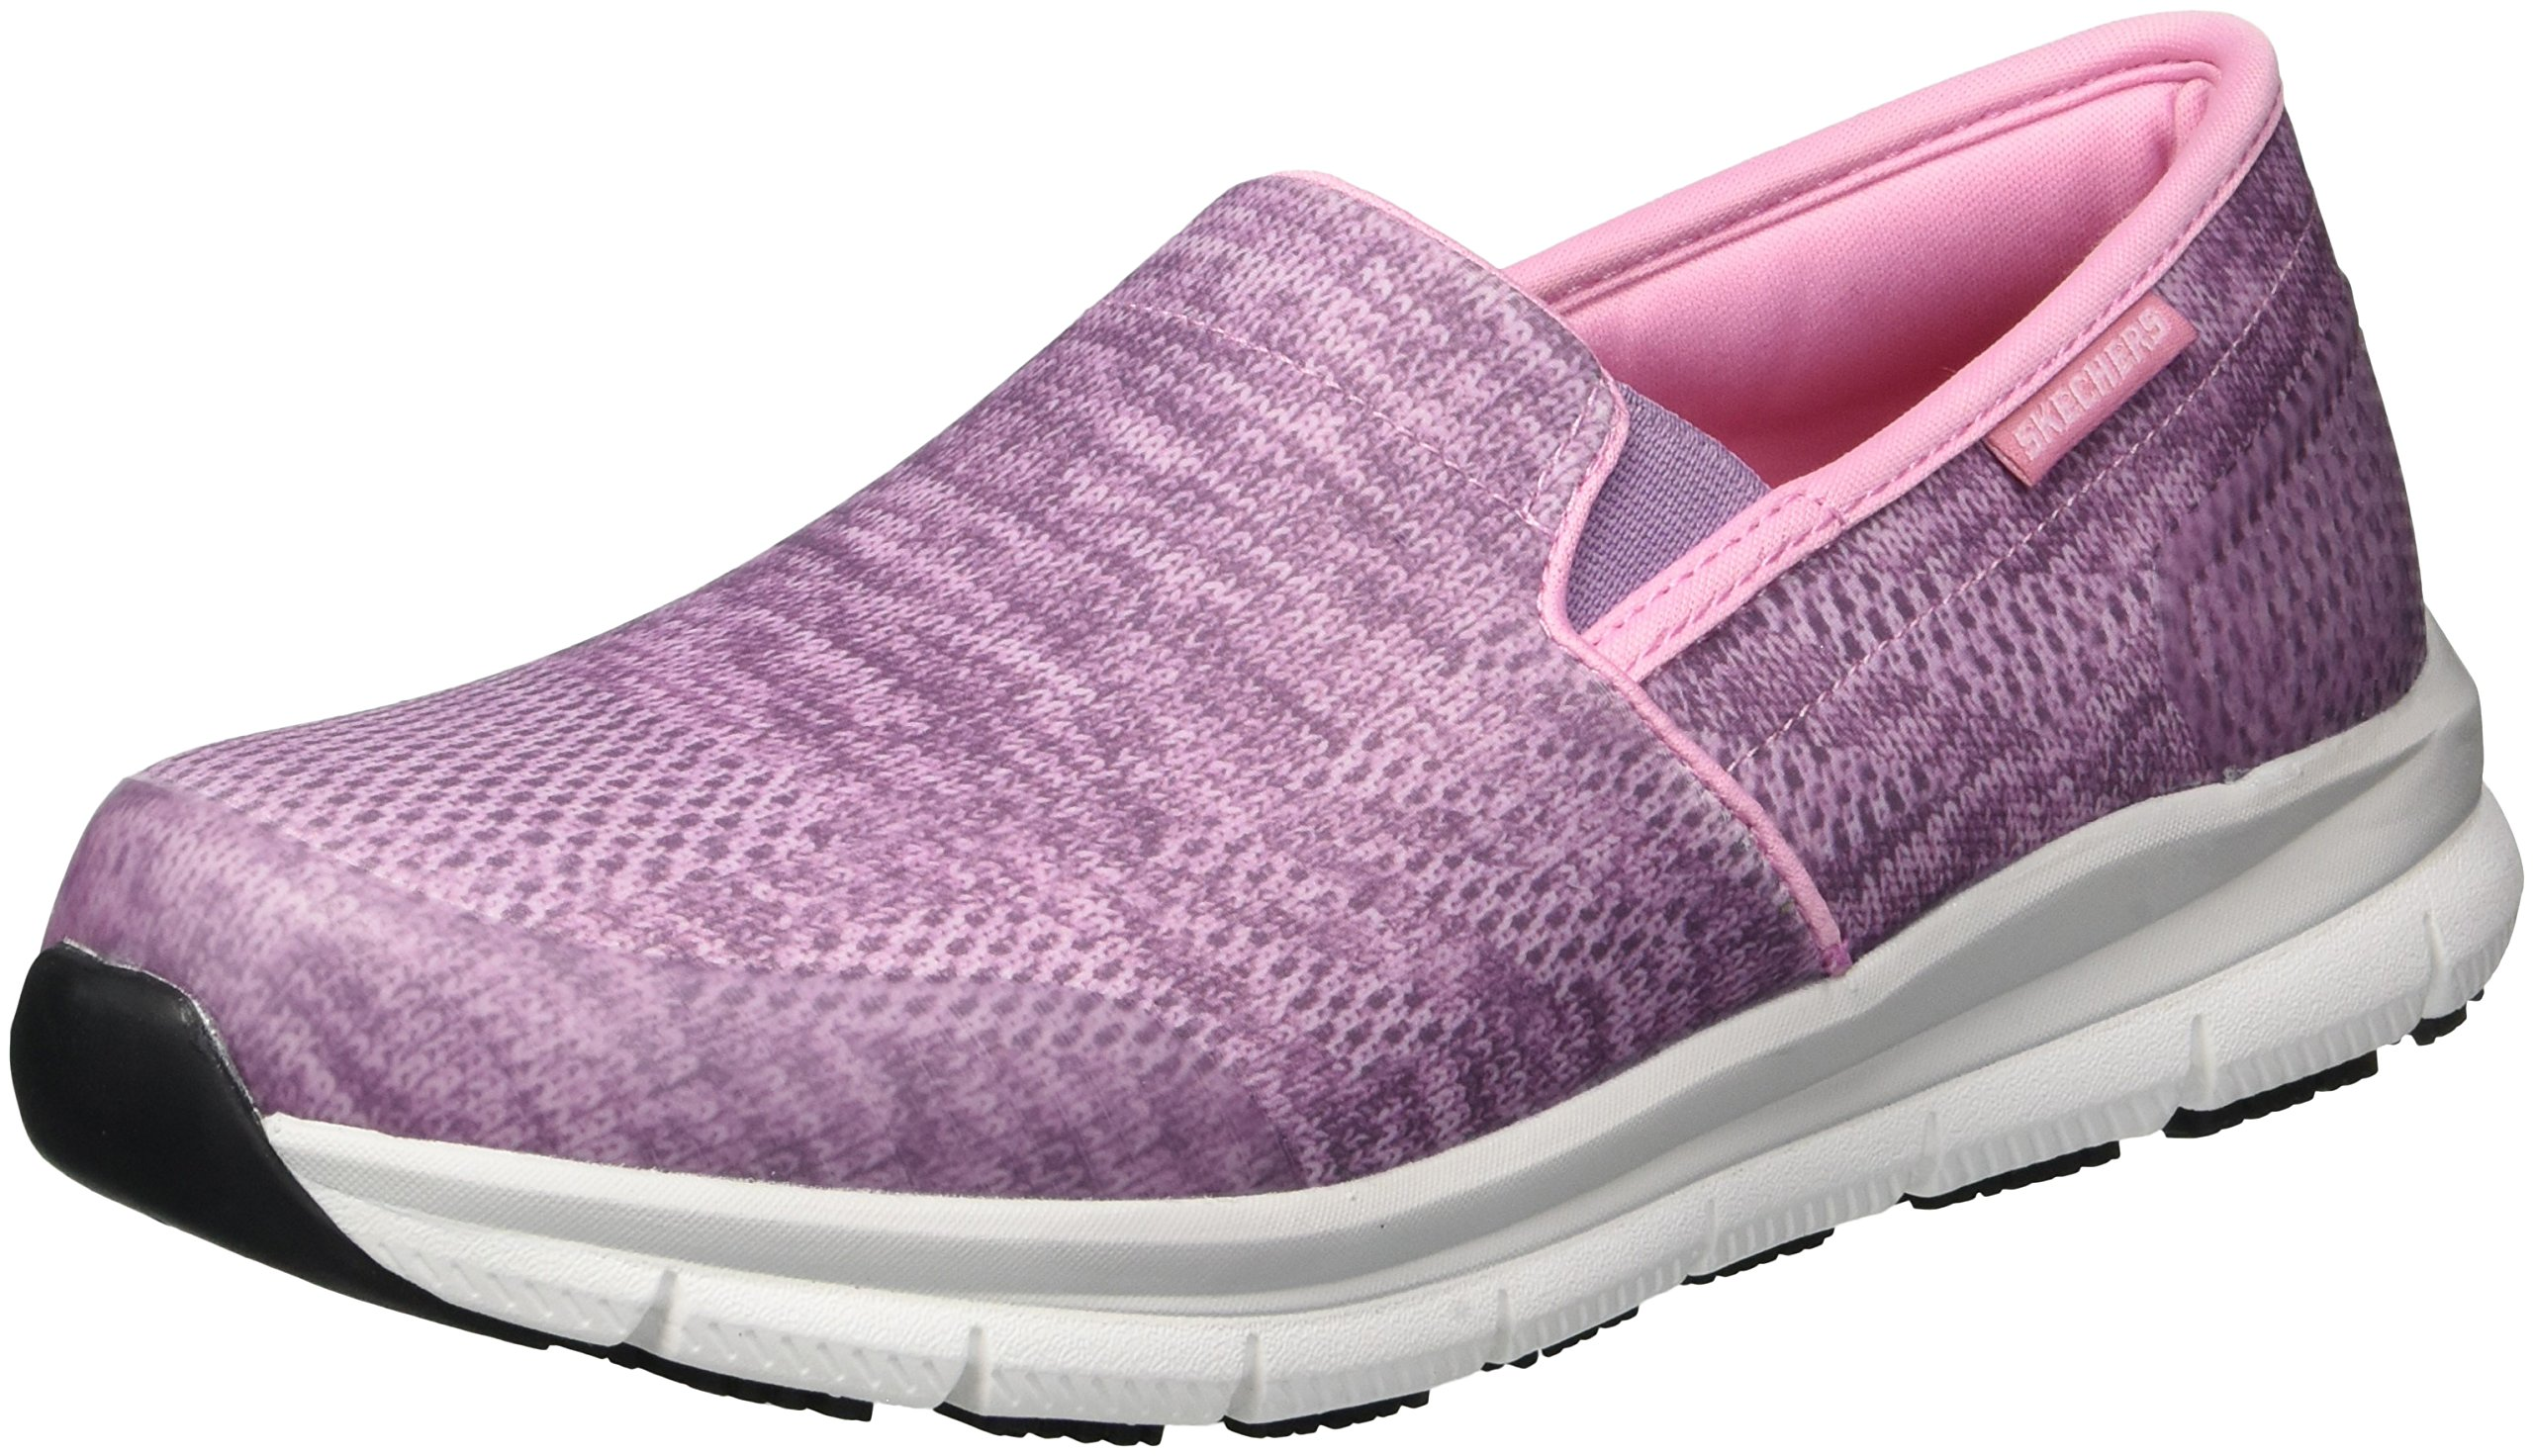 Skechers for Work Women's Comfort Flex HC Pro SR II Health Care Professional Shoe,Pink Textile,6.5 M US